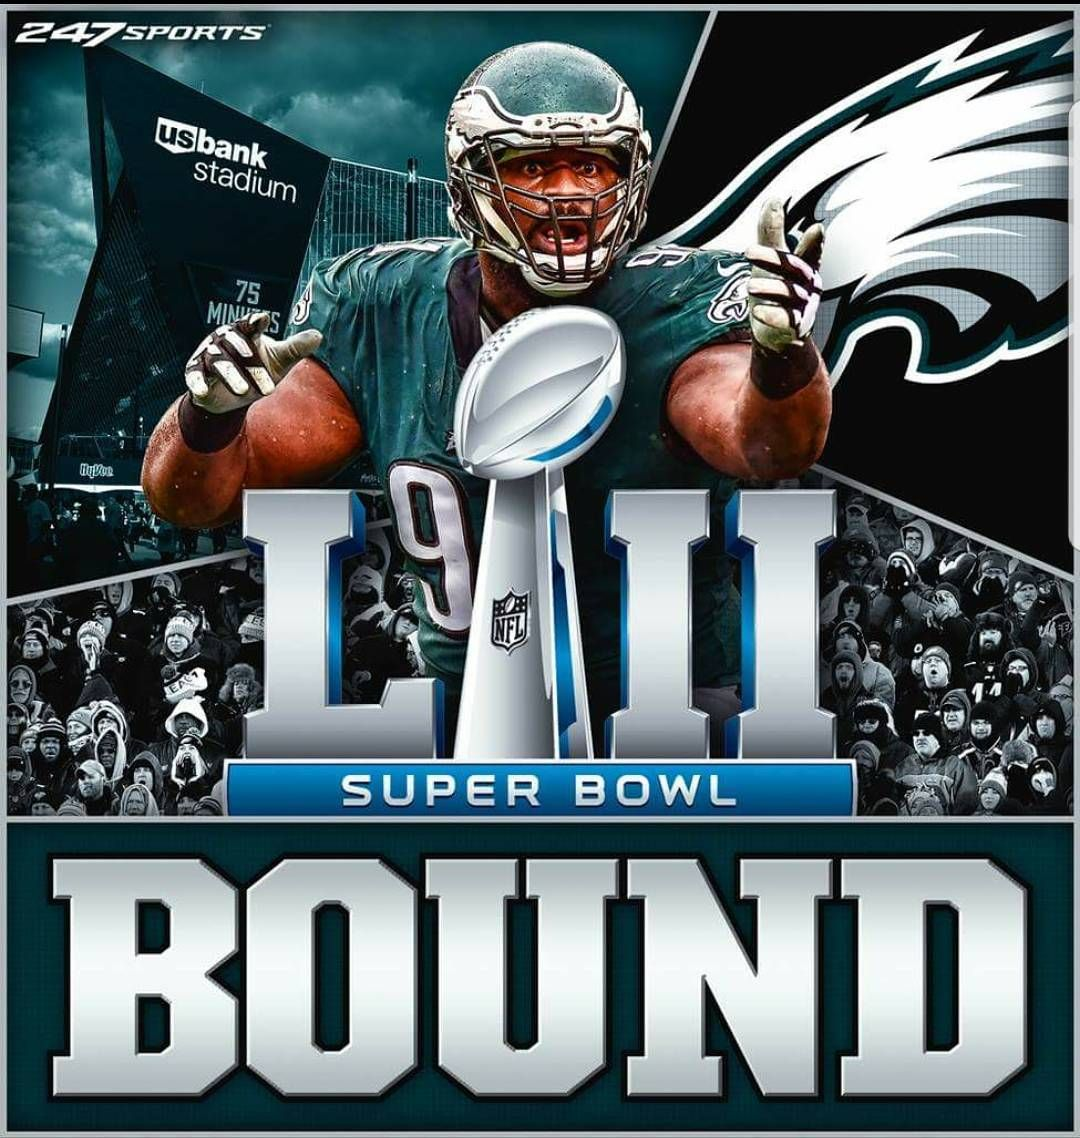 Pin By David Bonilla On Patriots Philadelphia Eagles Super Bowl Eagles Super Bowl Philadelphia Eagles